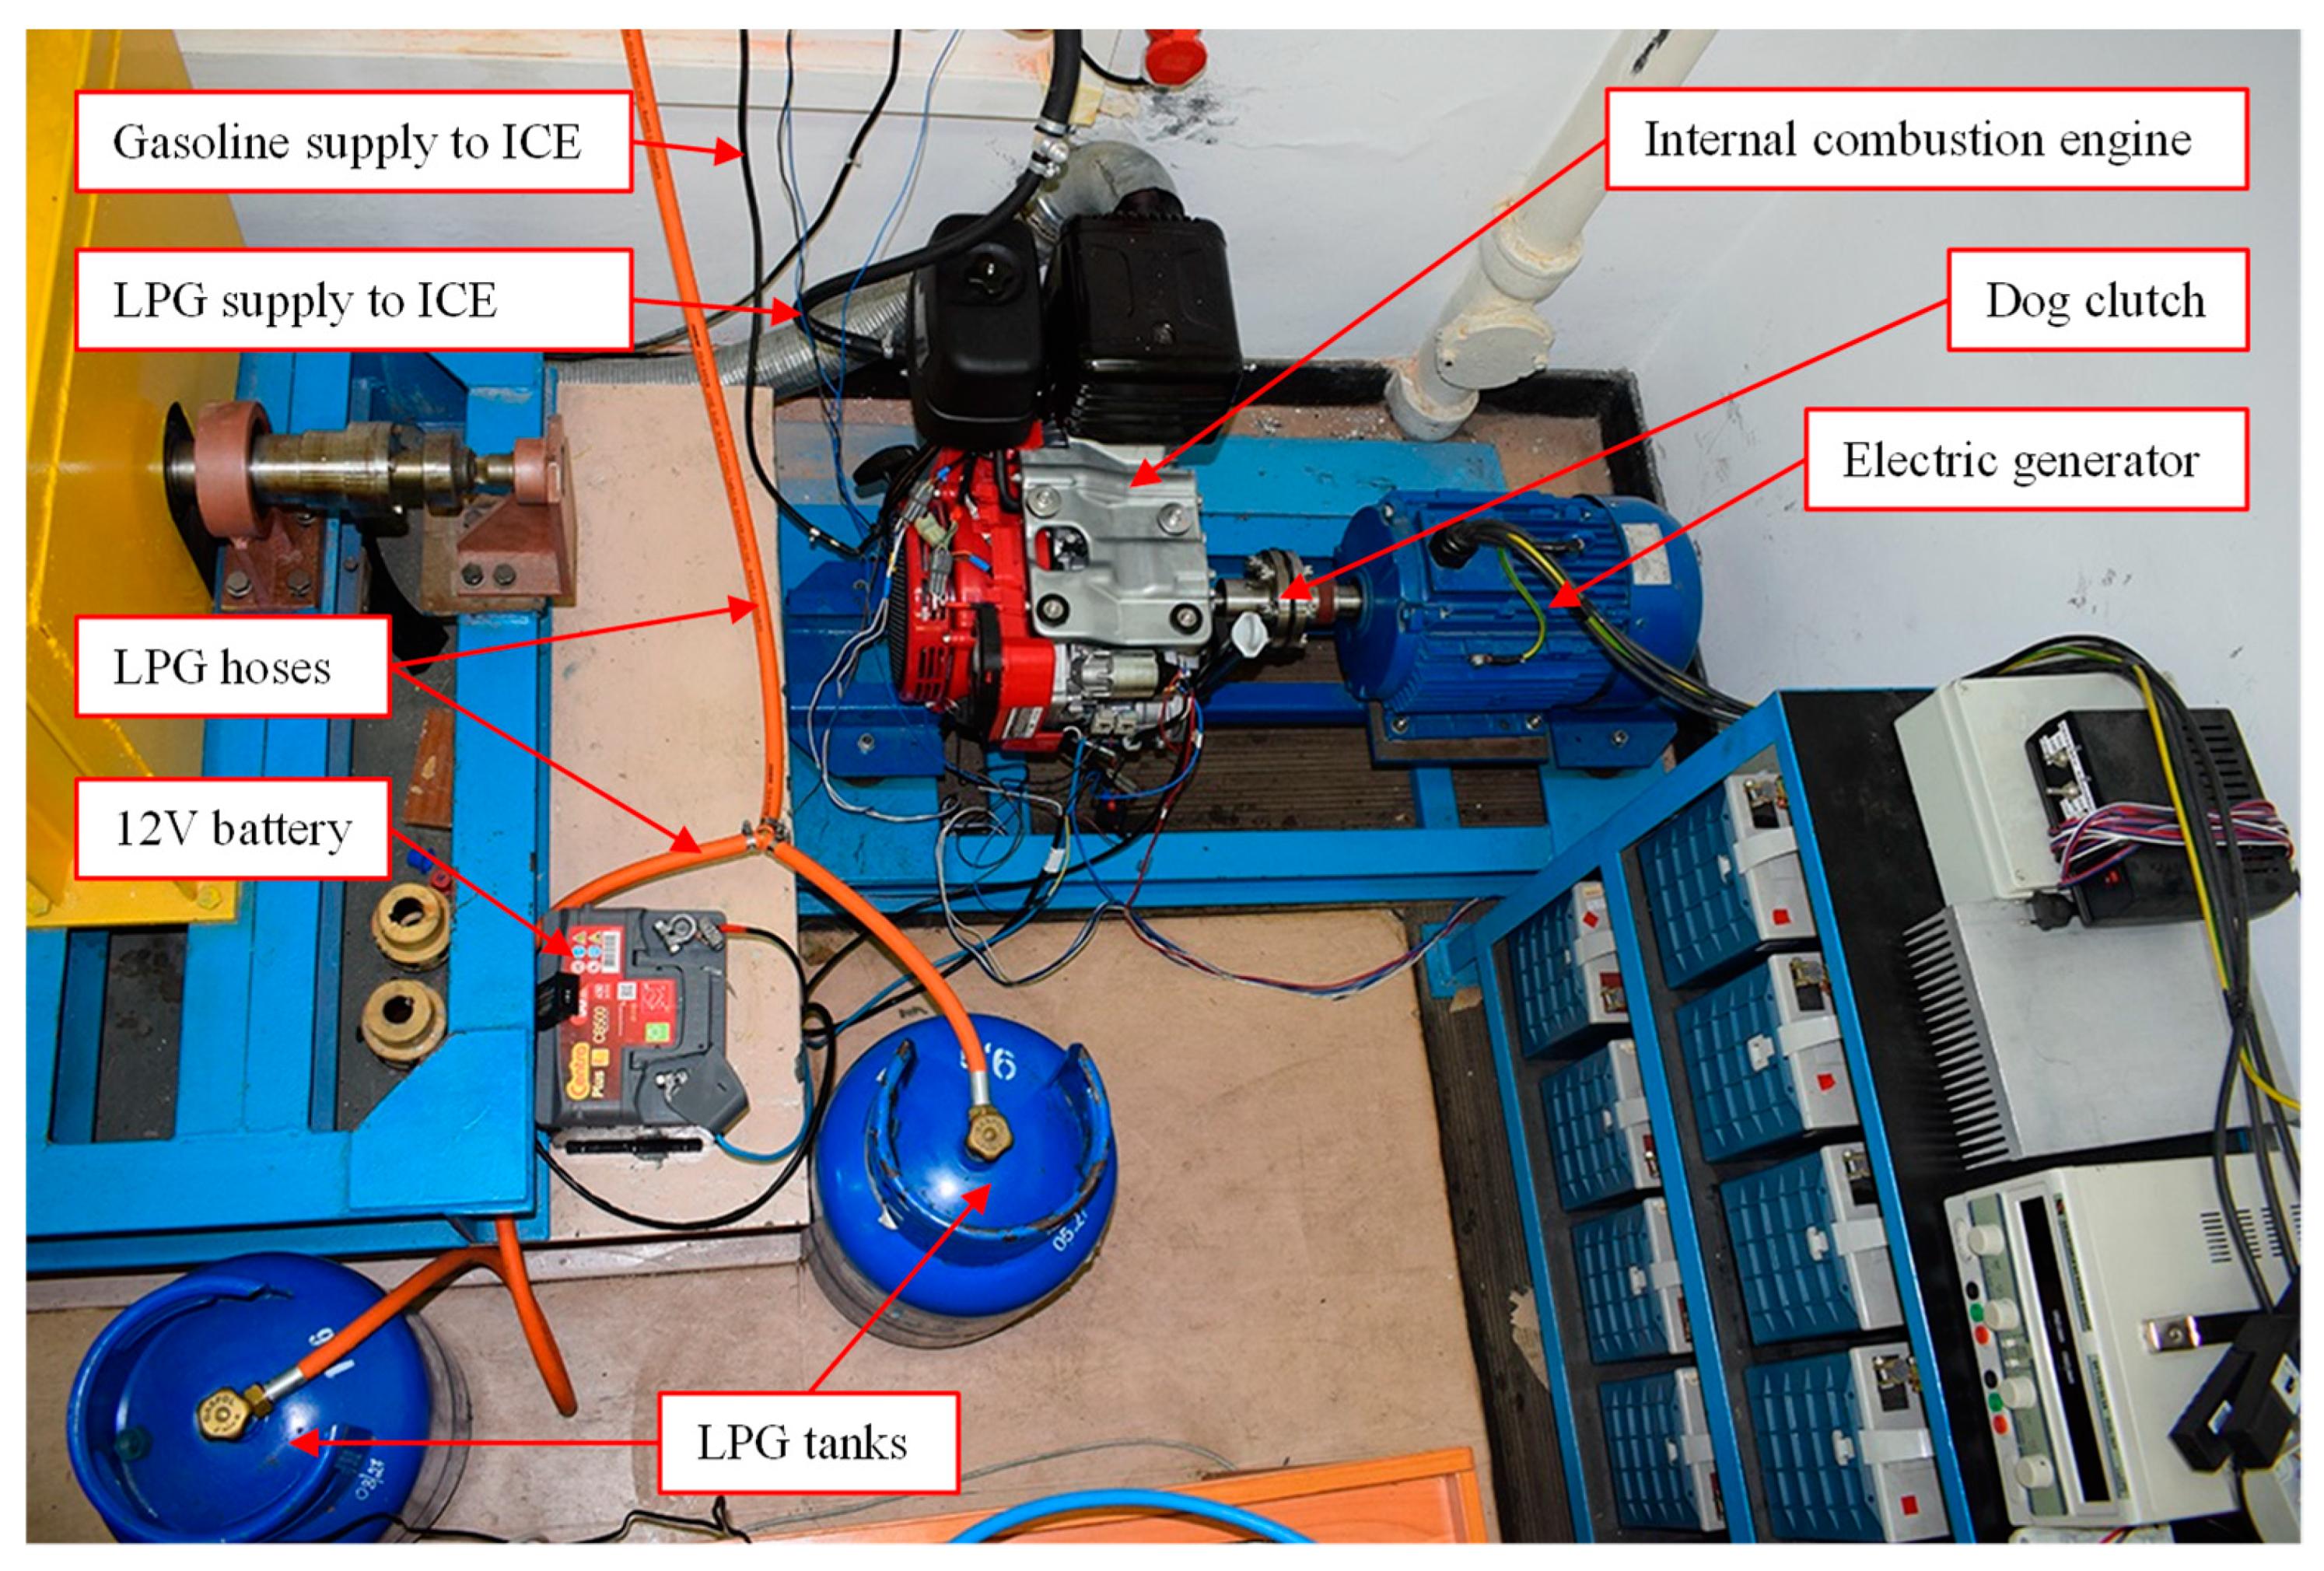 Chevy Engine Test Stand Wiring Diagram - Wiring Diagram